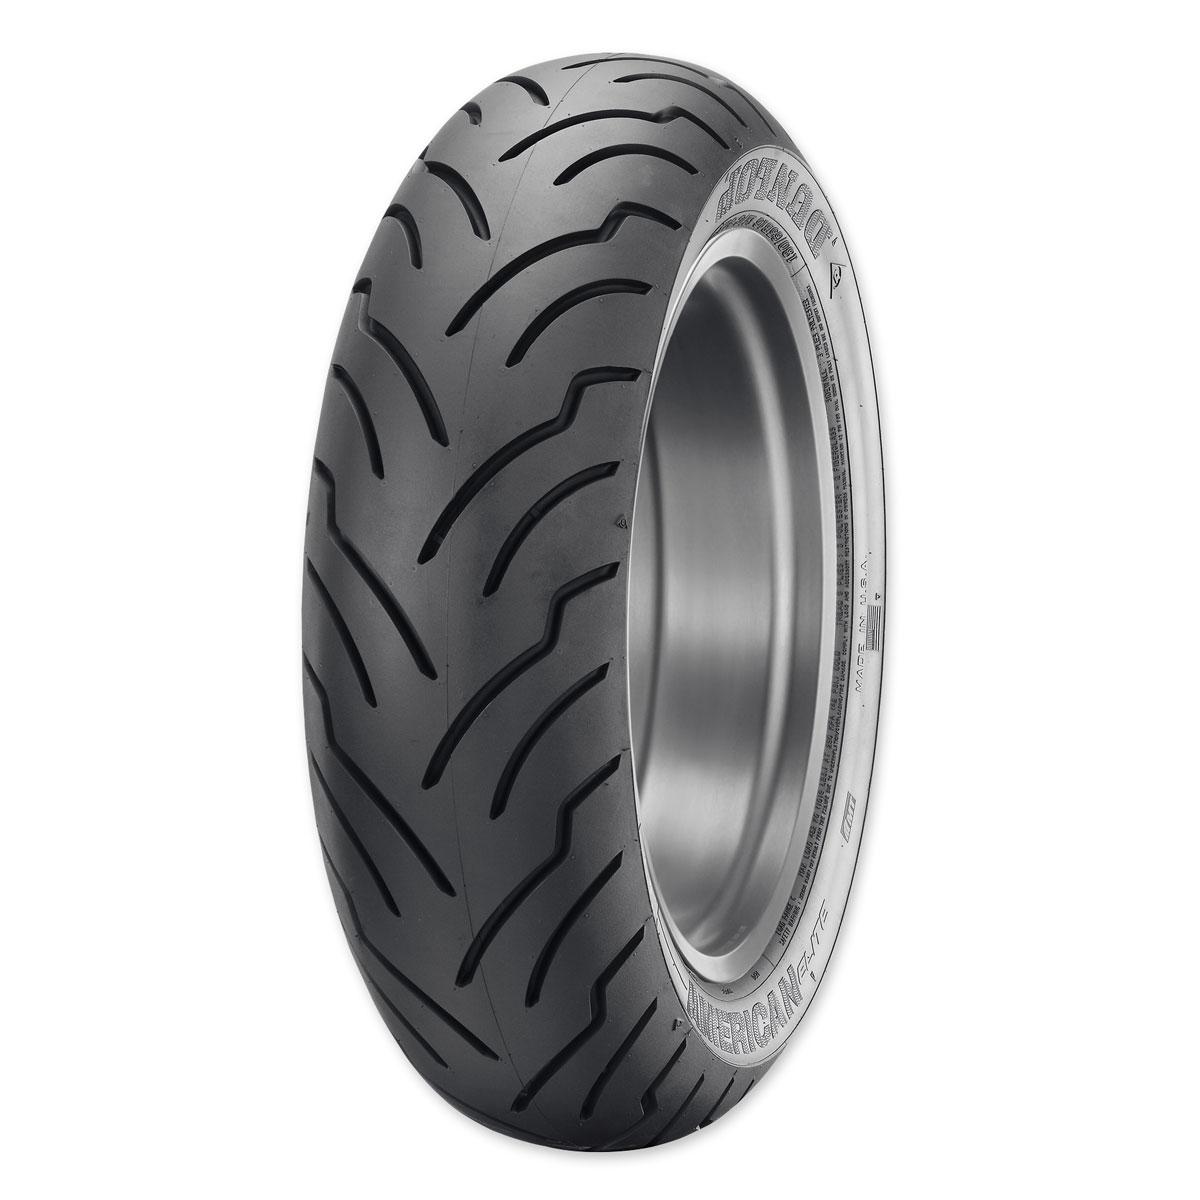 Dunlop American Elite 160/70B17 Rear Tire